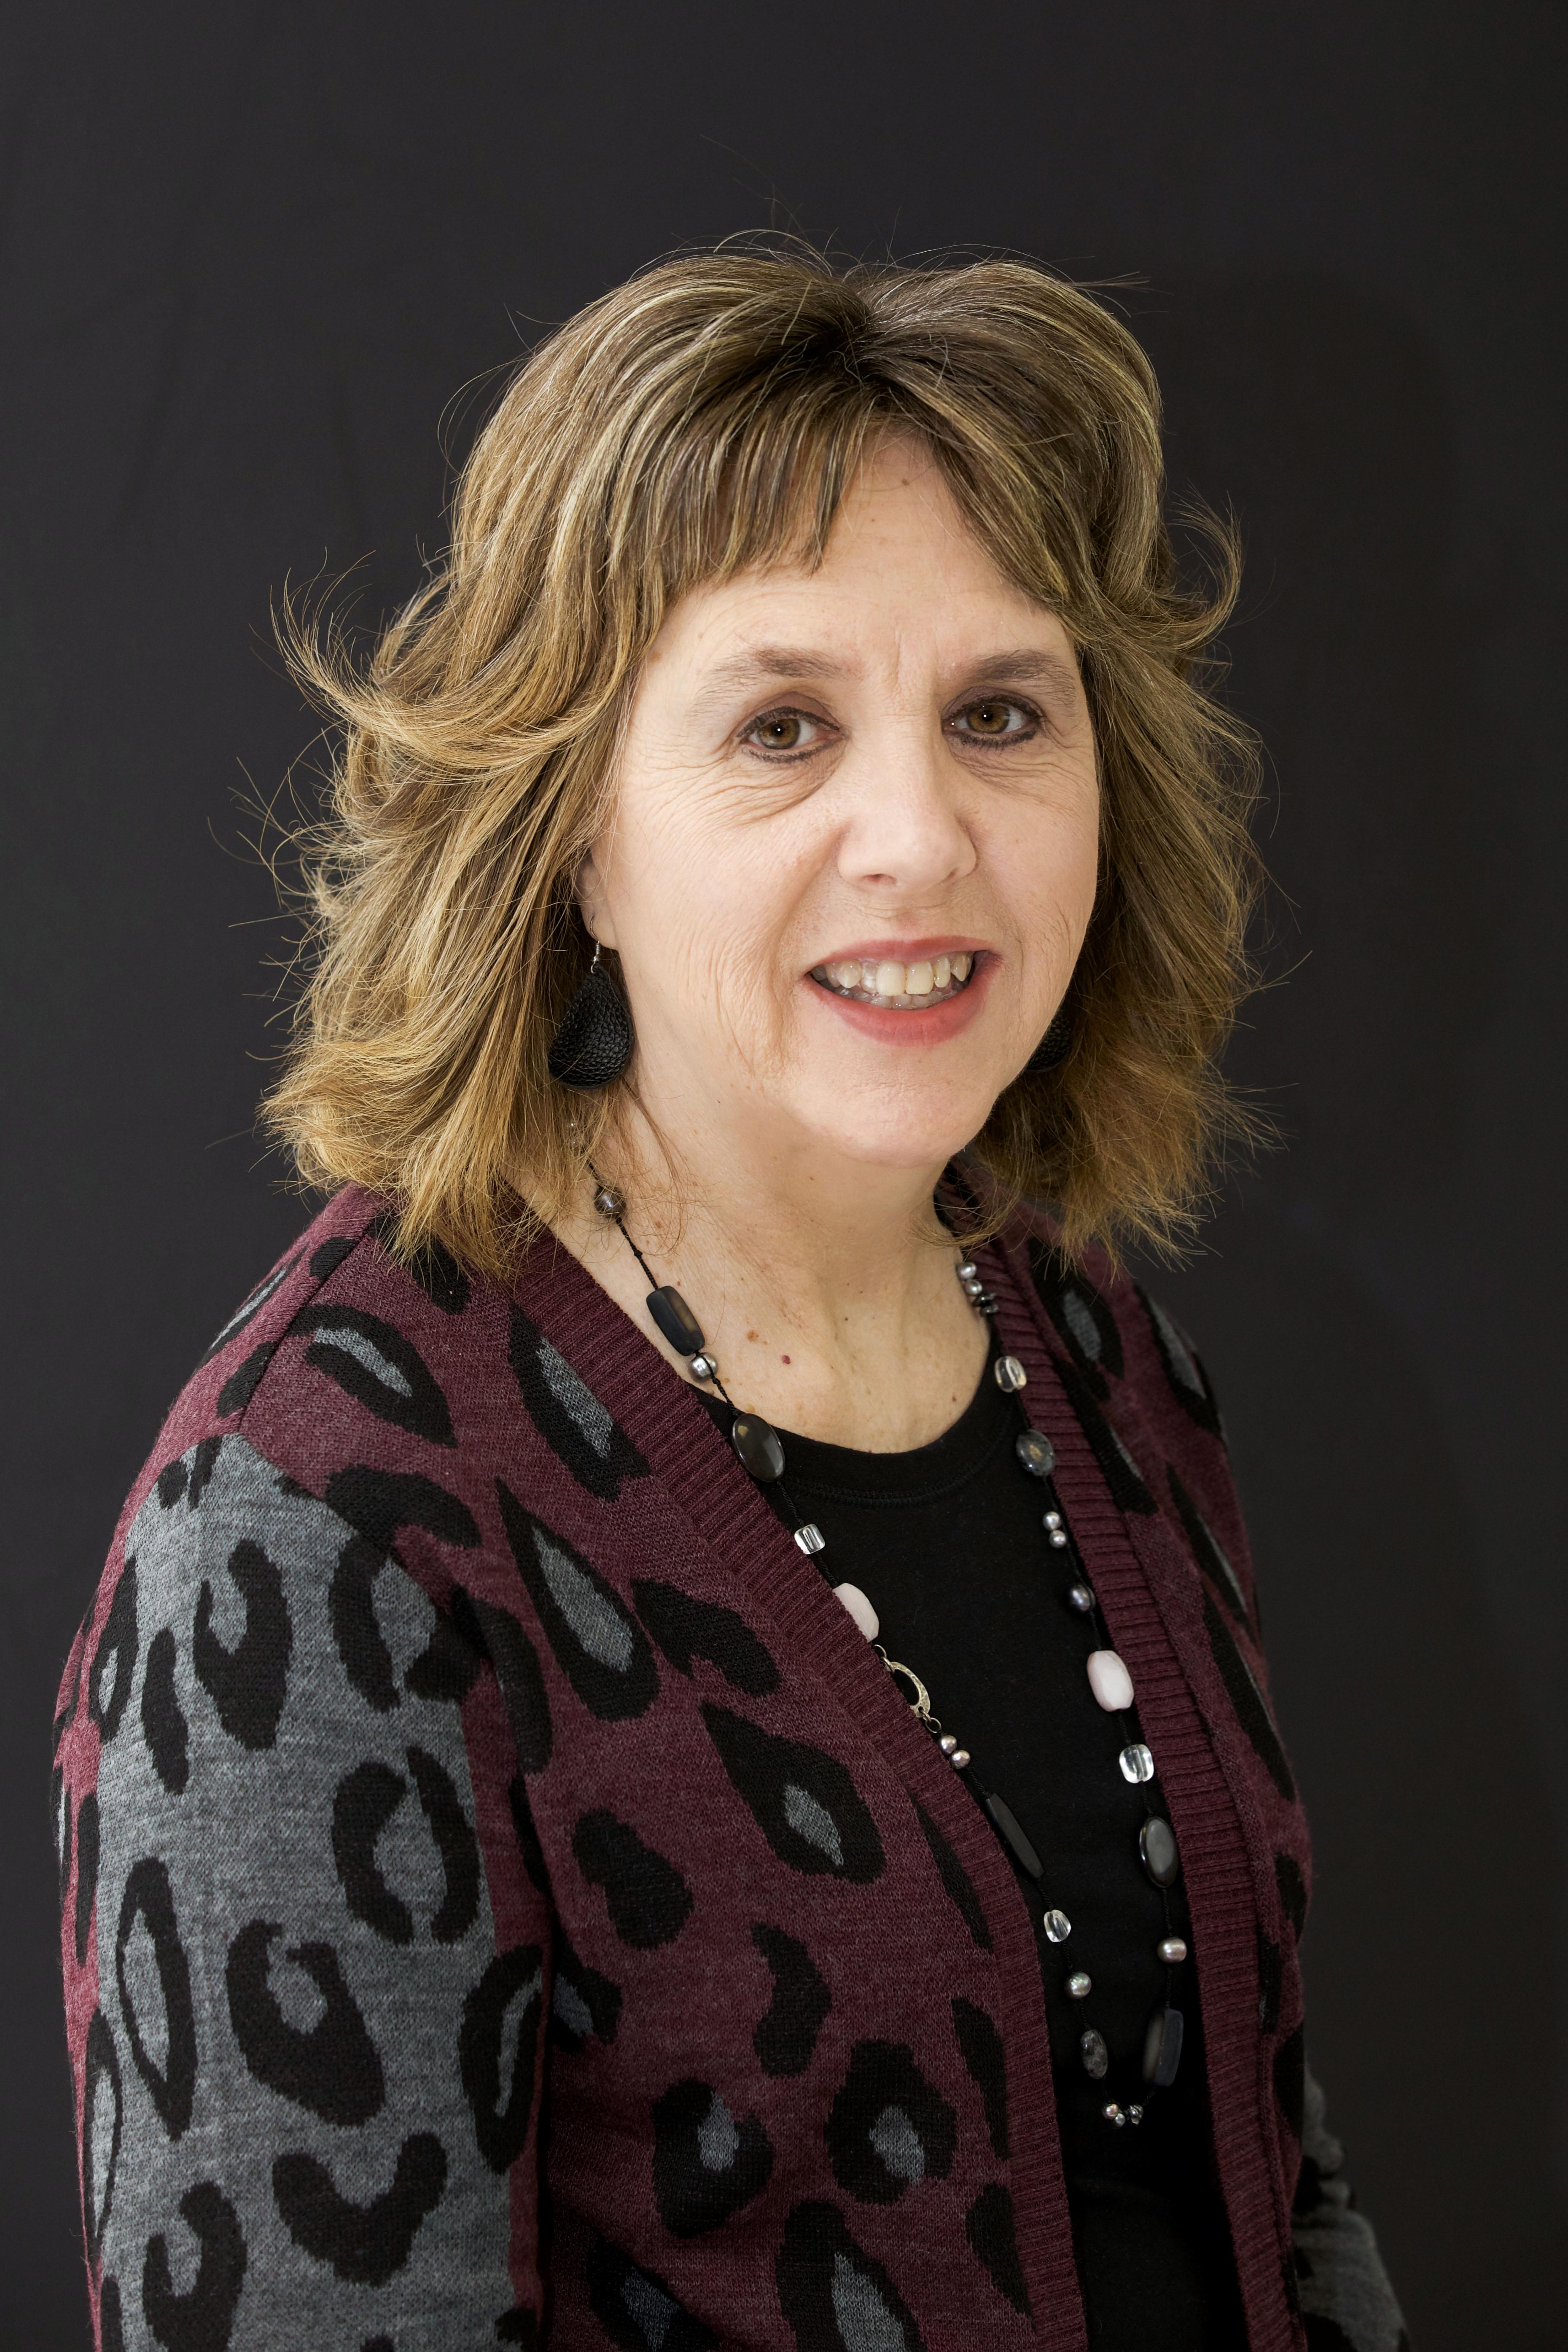 Kim Leffler, EMIS Coordinator/Registration